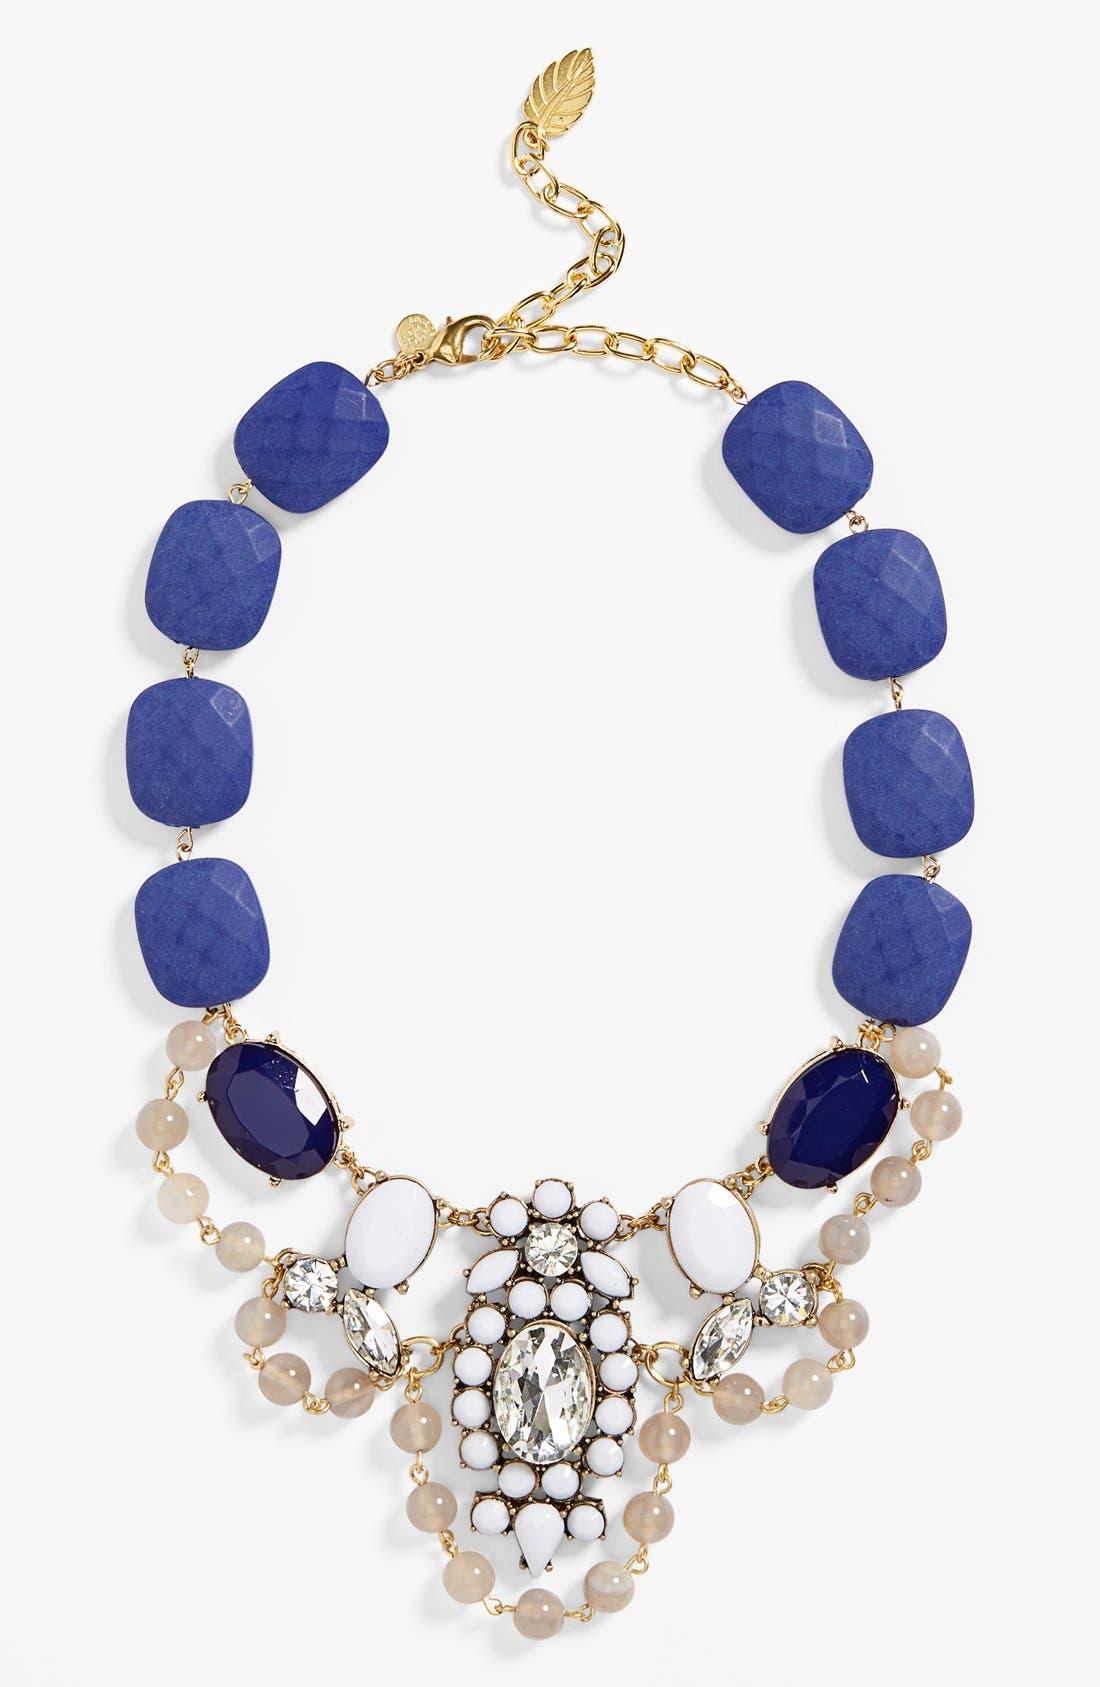 Alternate Image 1 Selected - David Aubrey 'Clara' Beaded Crystal Statement Necklace